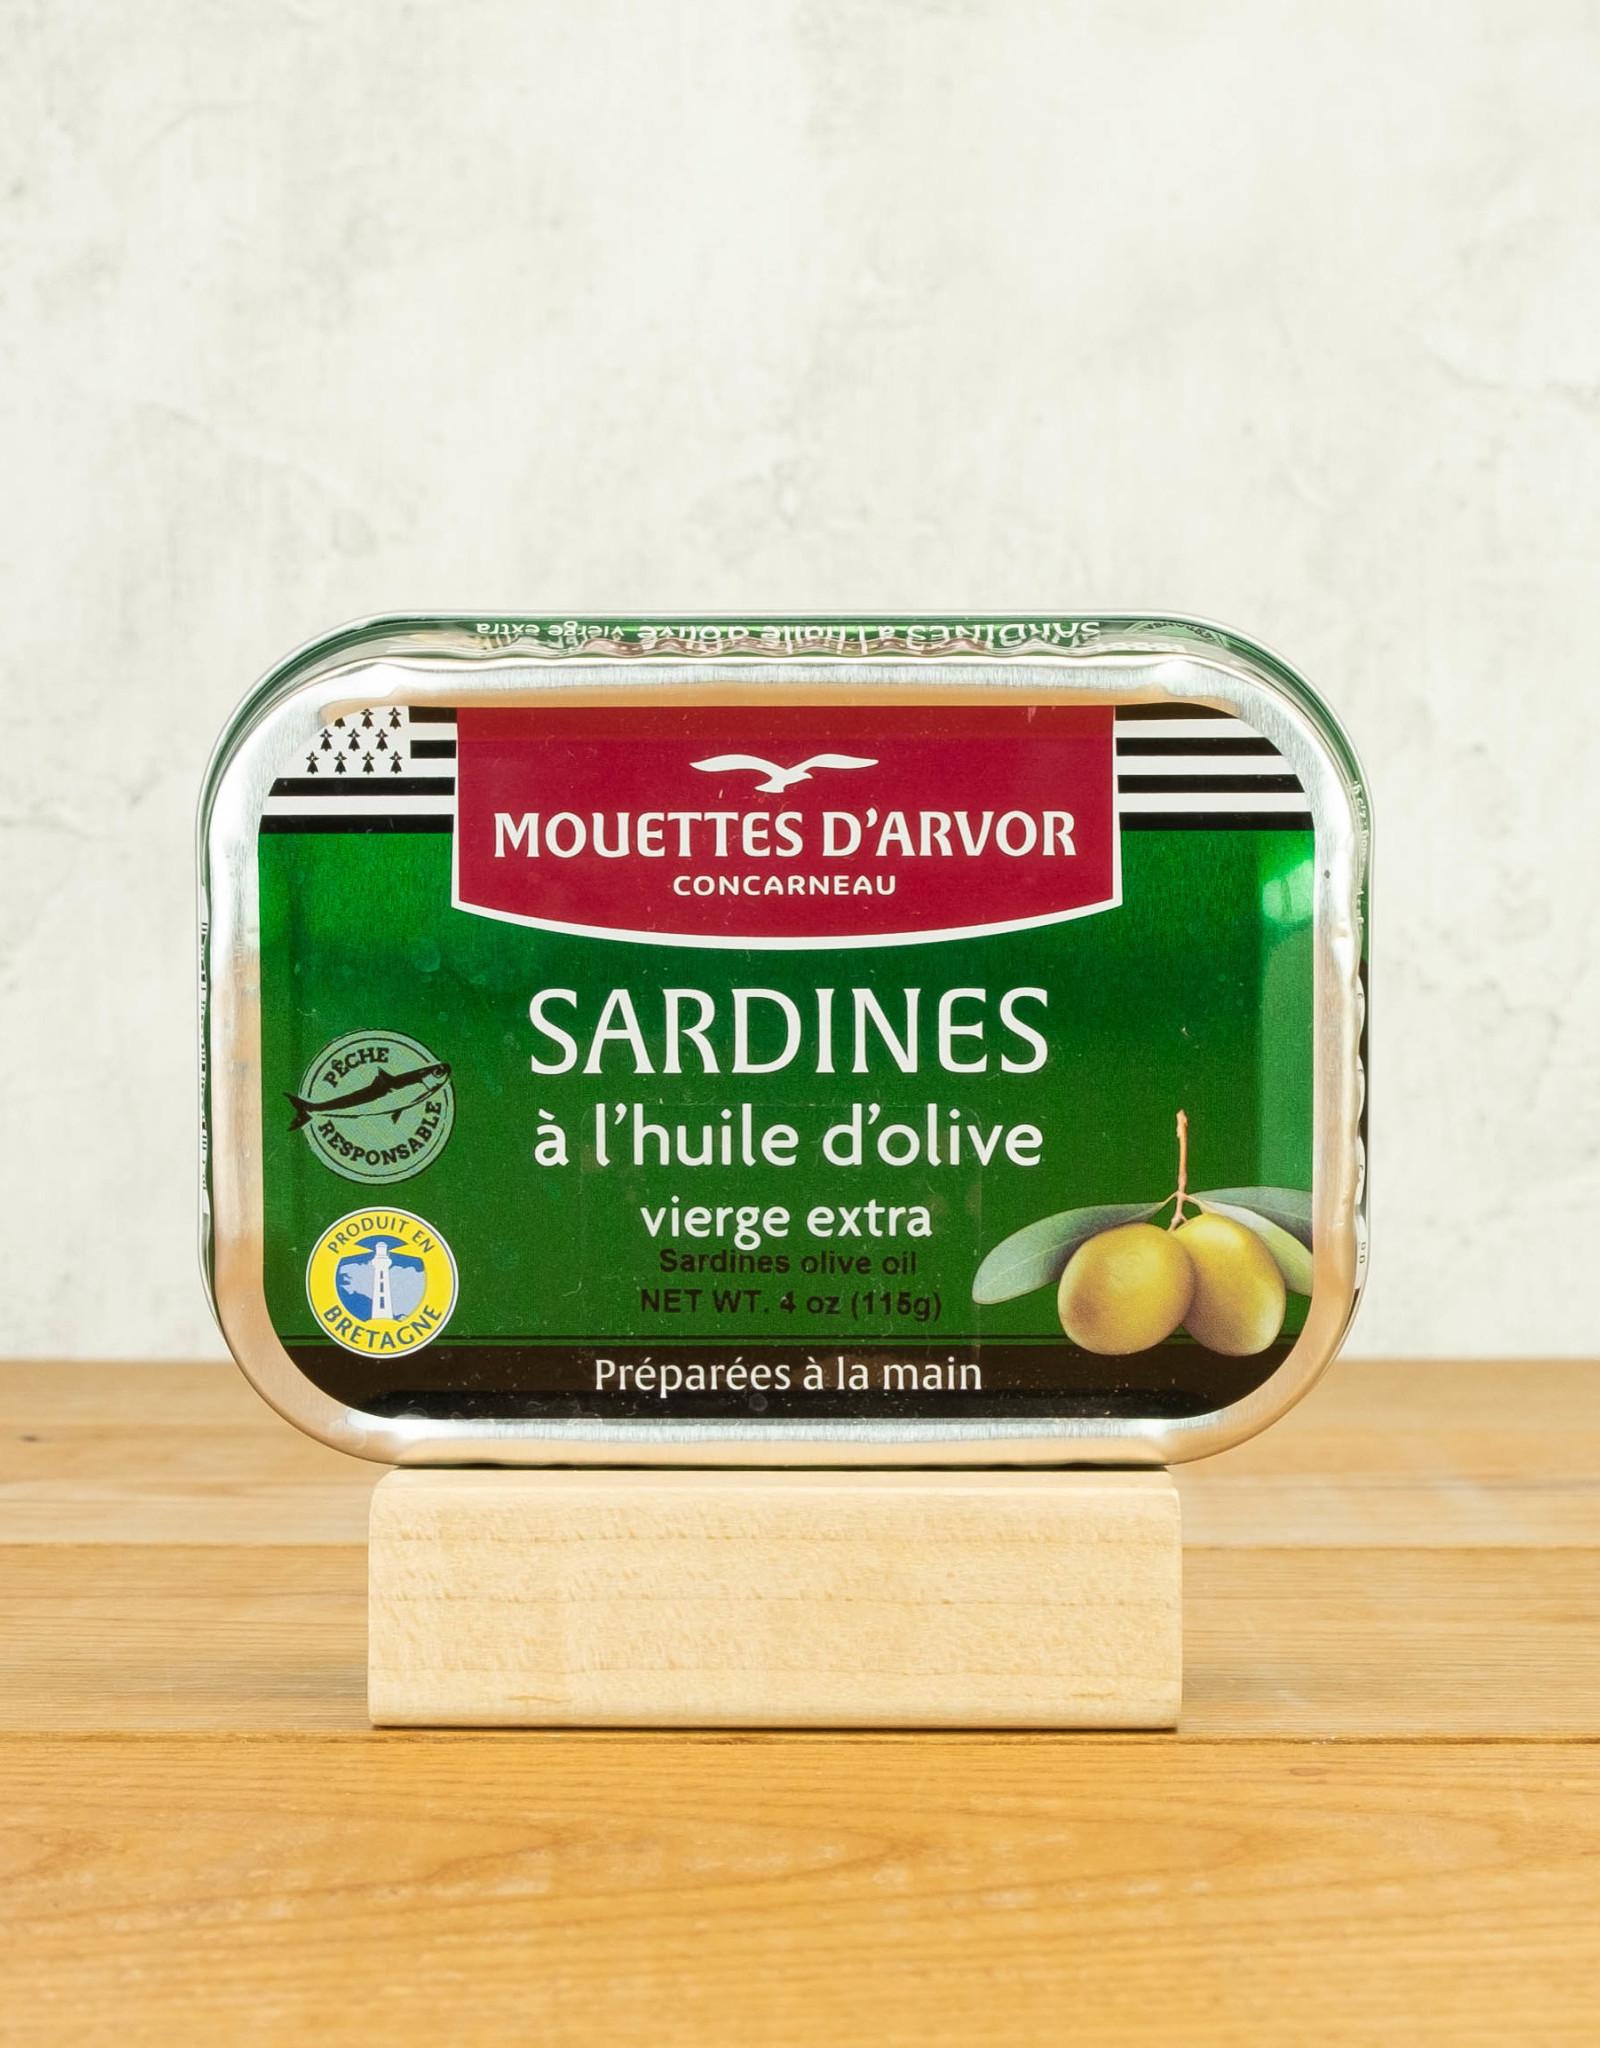 Les Mouettes D'Arvor Sardines in EVOO